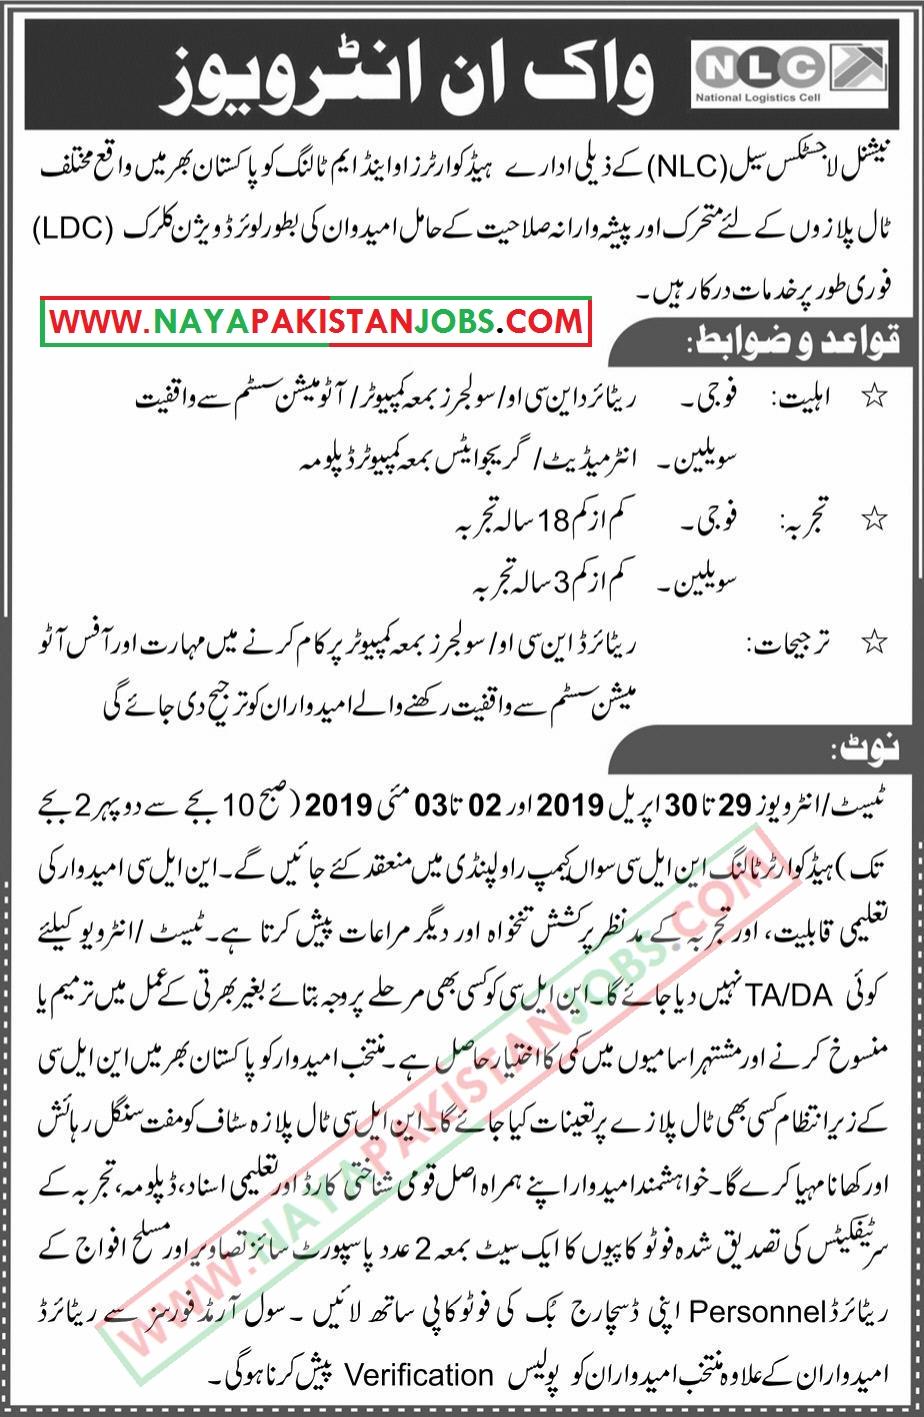 NLC Jobs 2019 Rawalpindi , NLC Jobs for LDC, NLC Civilian Jobs, National Logistics Cell NLC Jobs 2019 April for 100 LDC